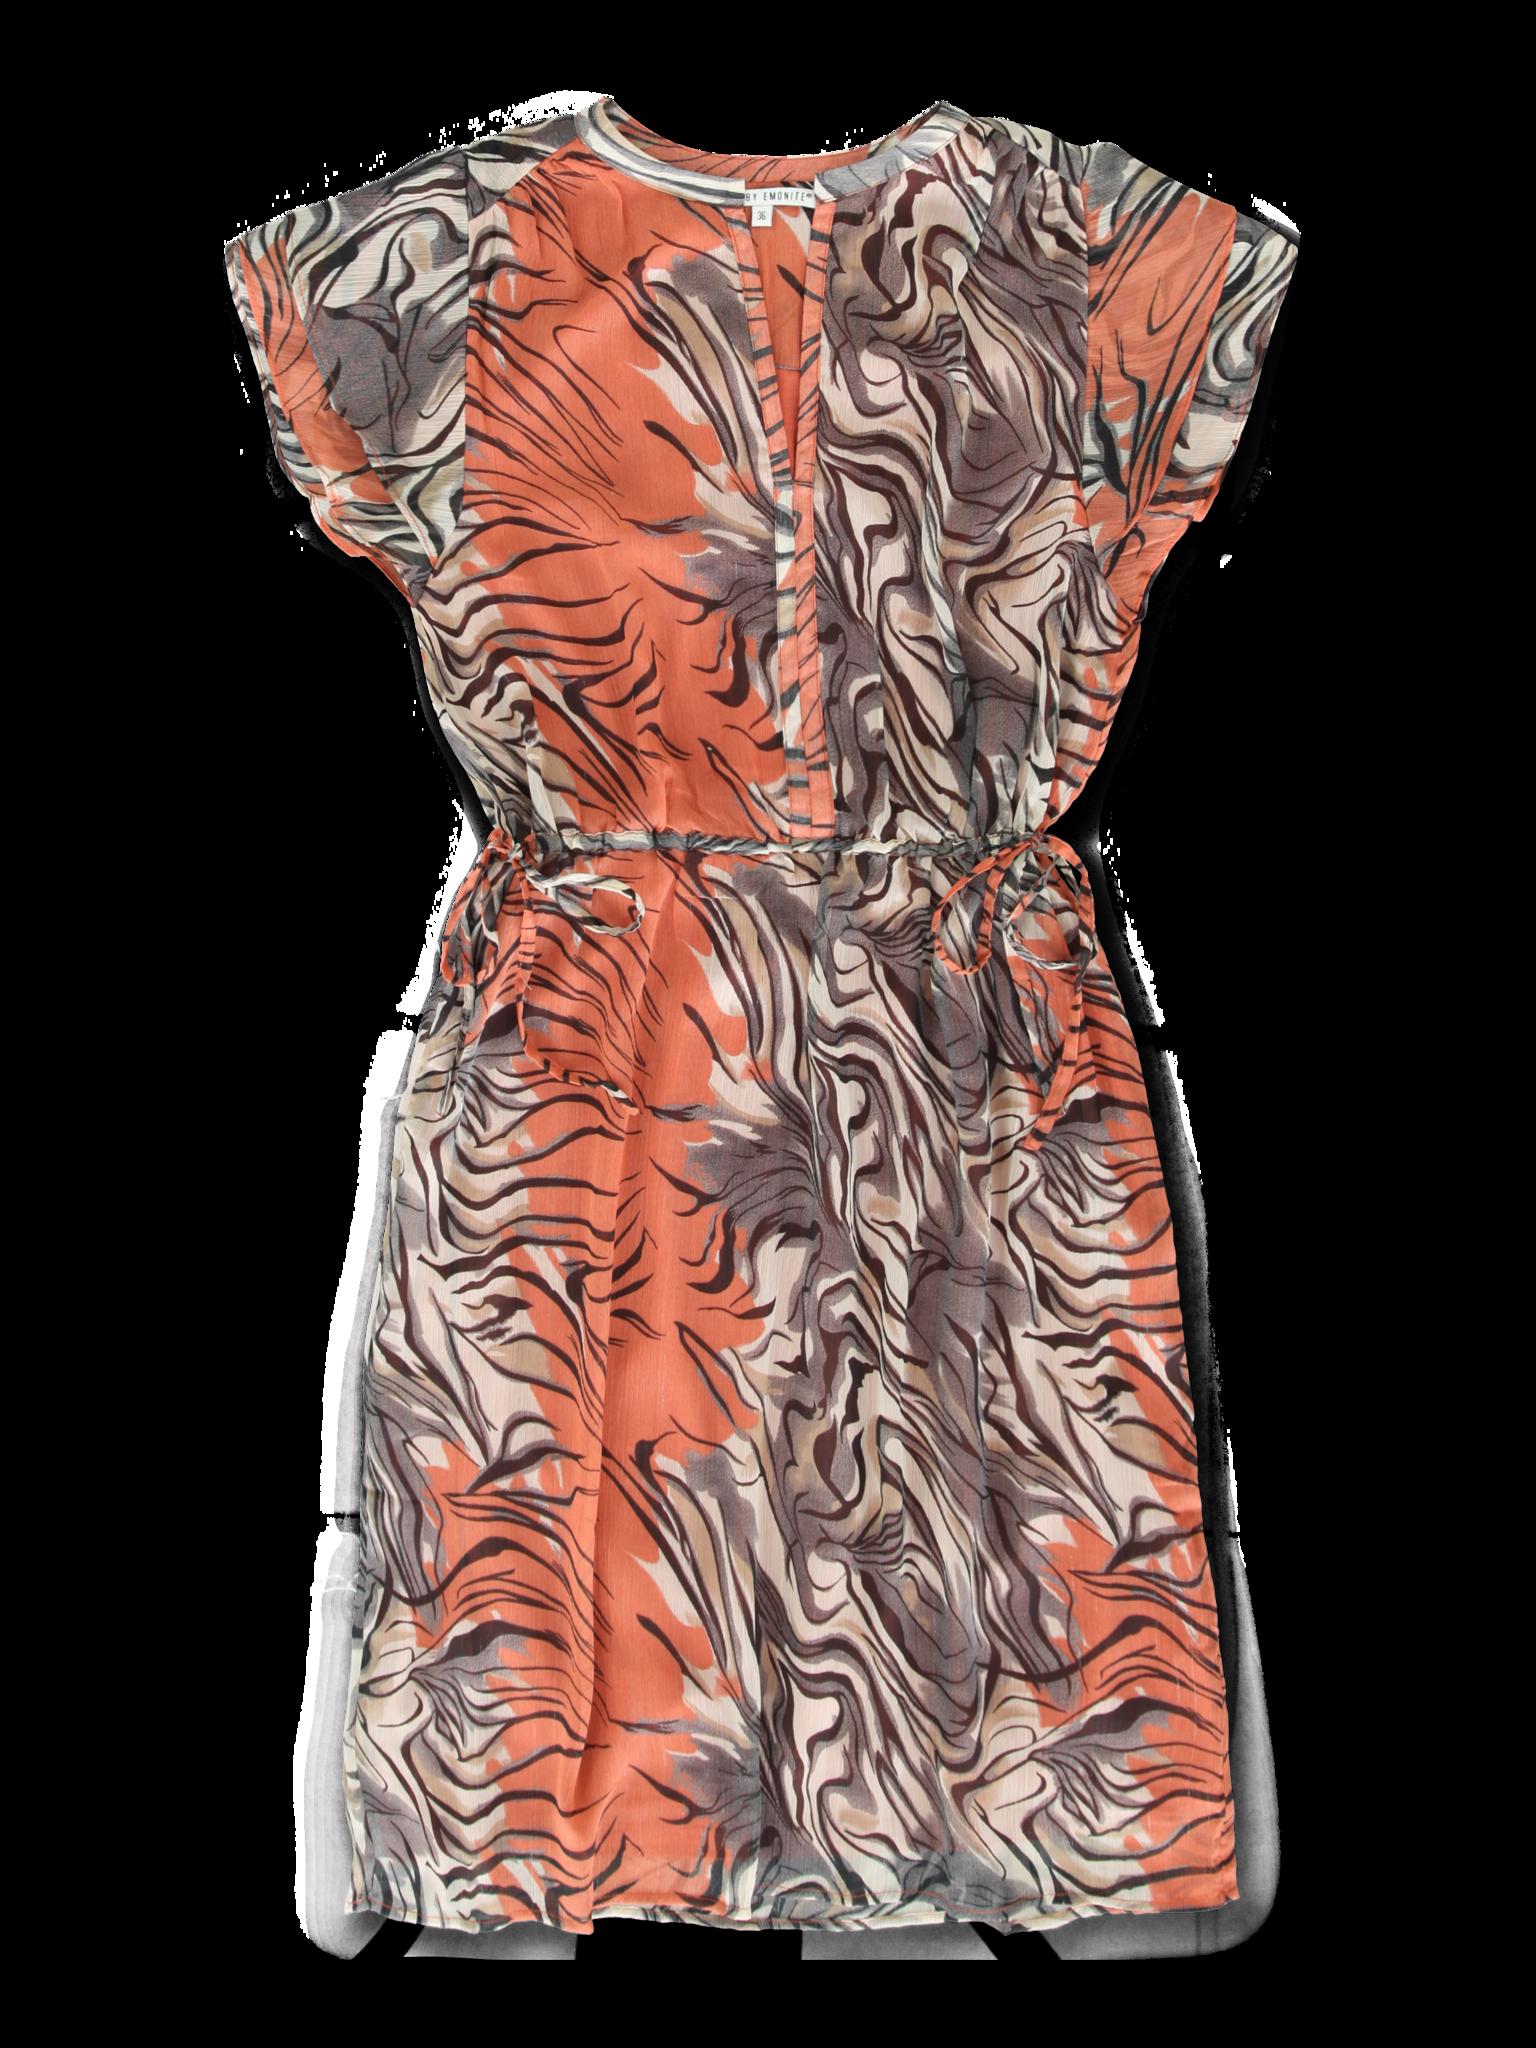 Emoi | Summer 2020 Ladies | Dress | 18 pcs/box